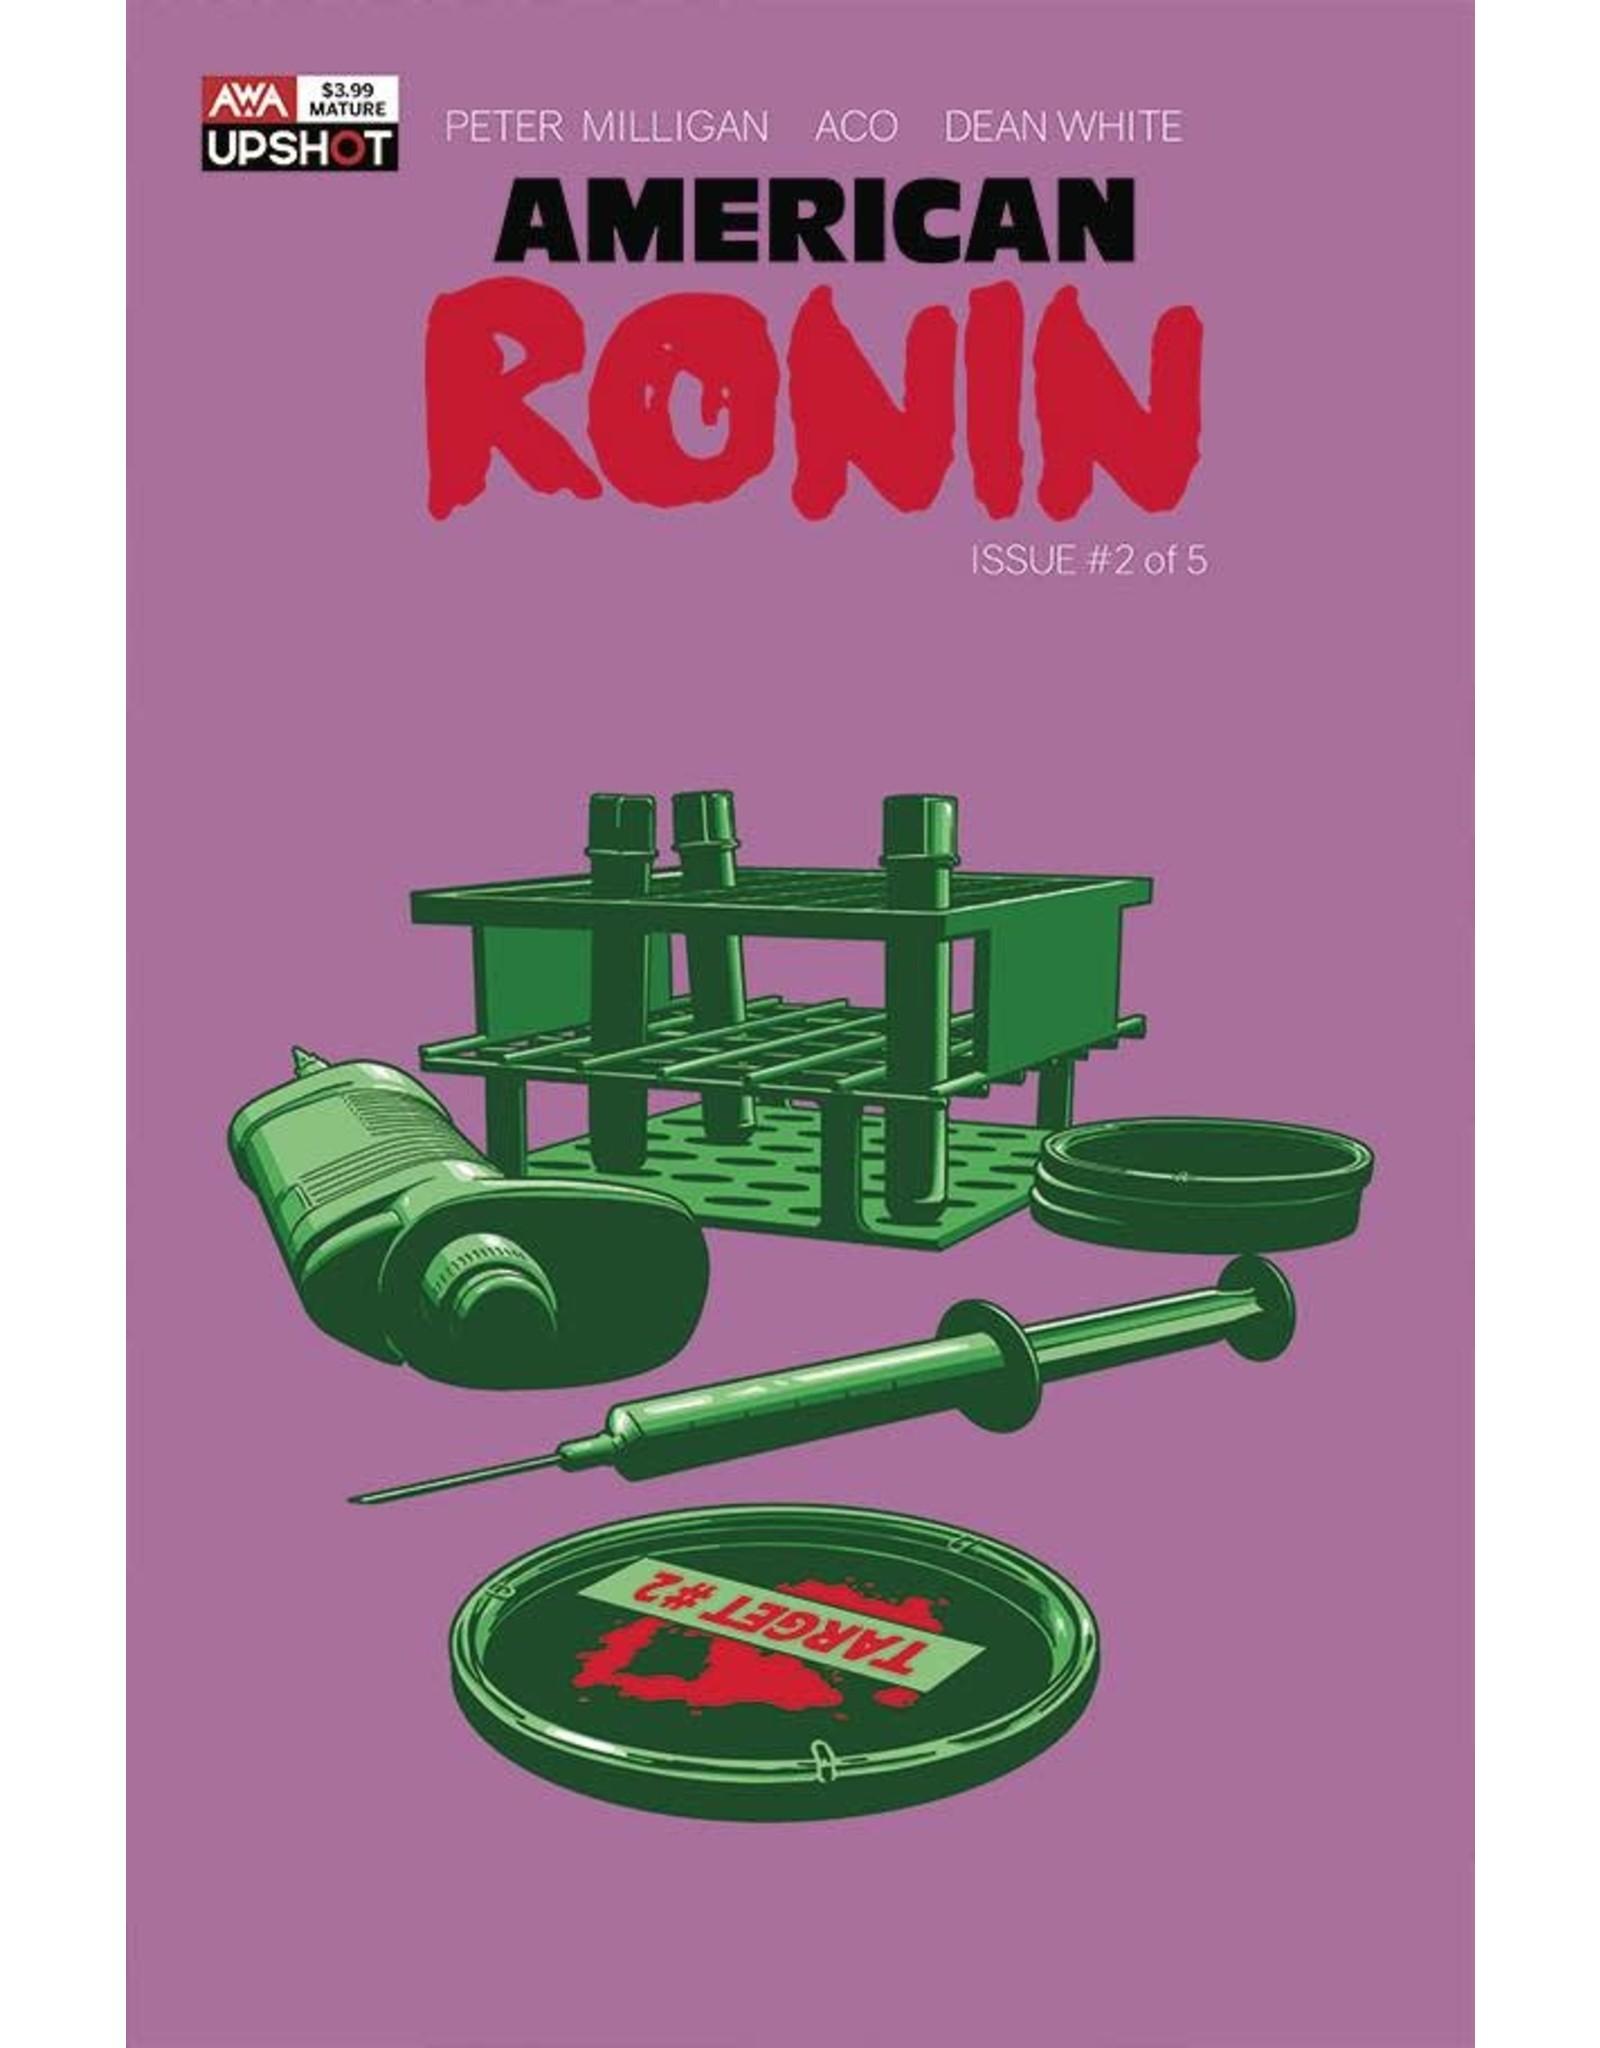 ARTISTS WRITERS & ARTISANS INC AMERICAN RONIN #2 (OF 5) CVR A ACO (MR)